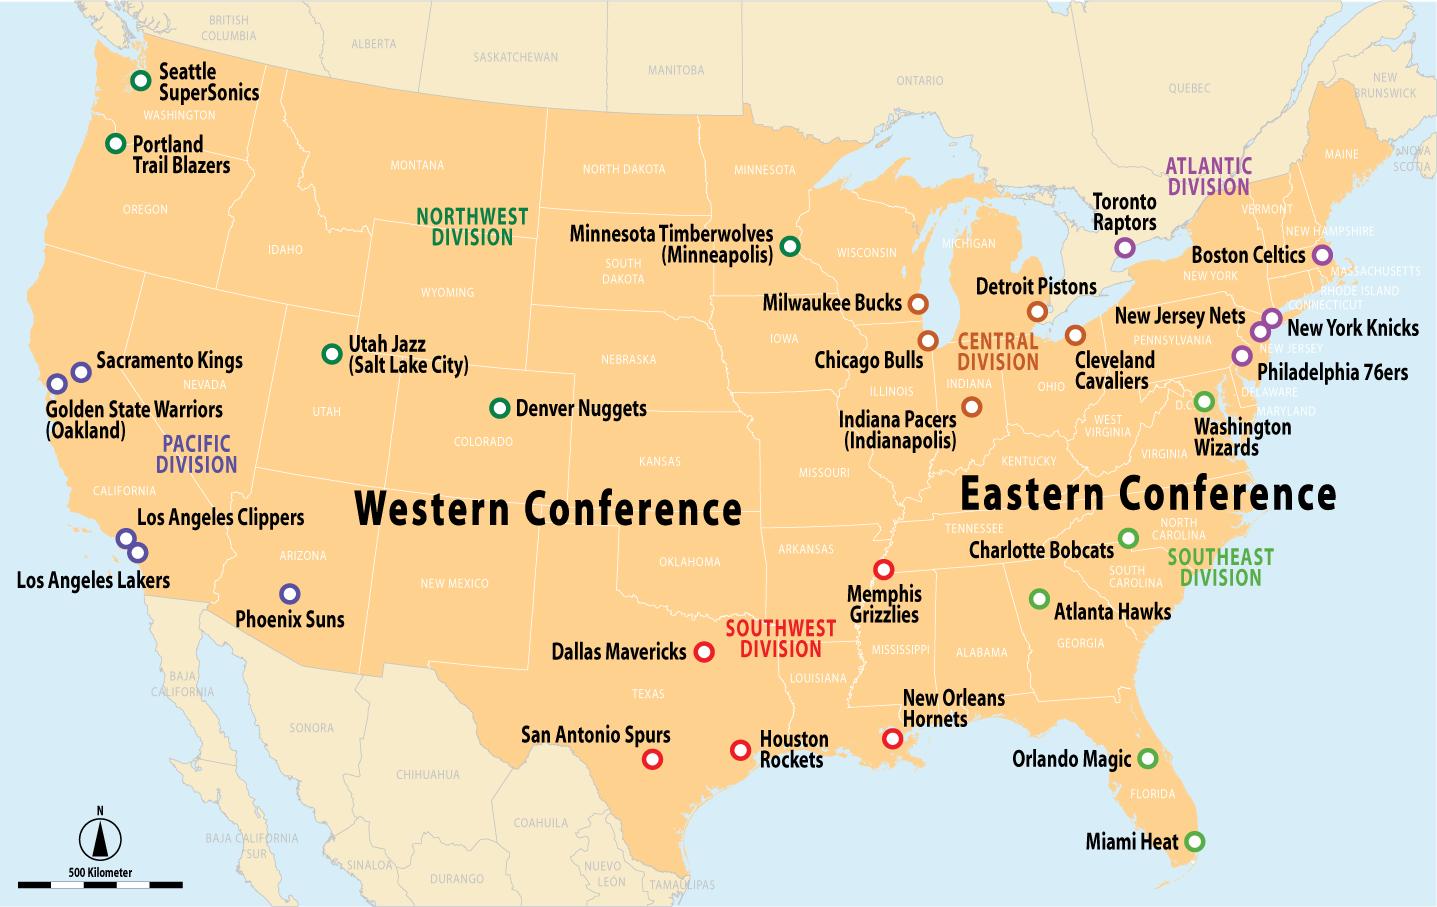 America Map Nba Google Images America Map Nba Google Images The - Us map nba cities